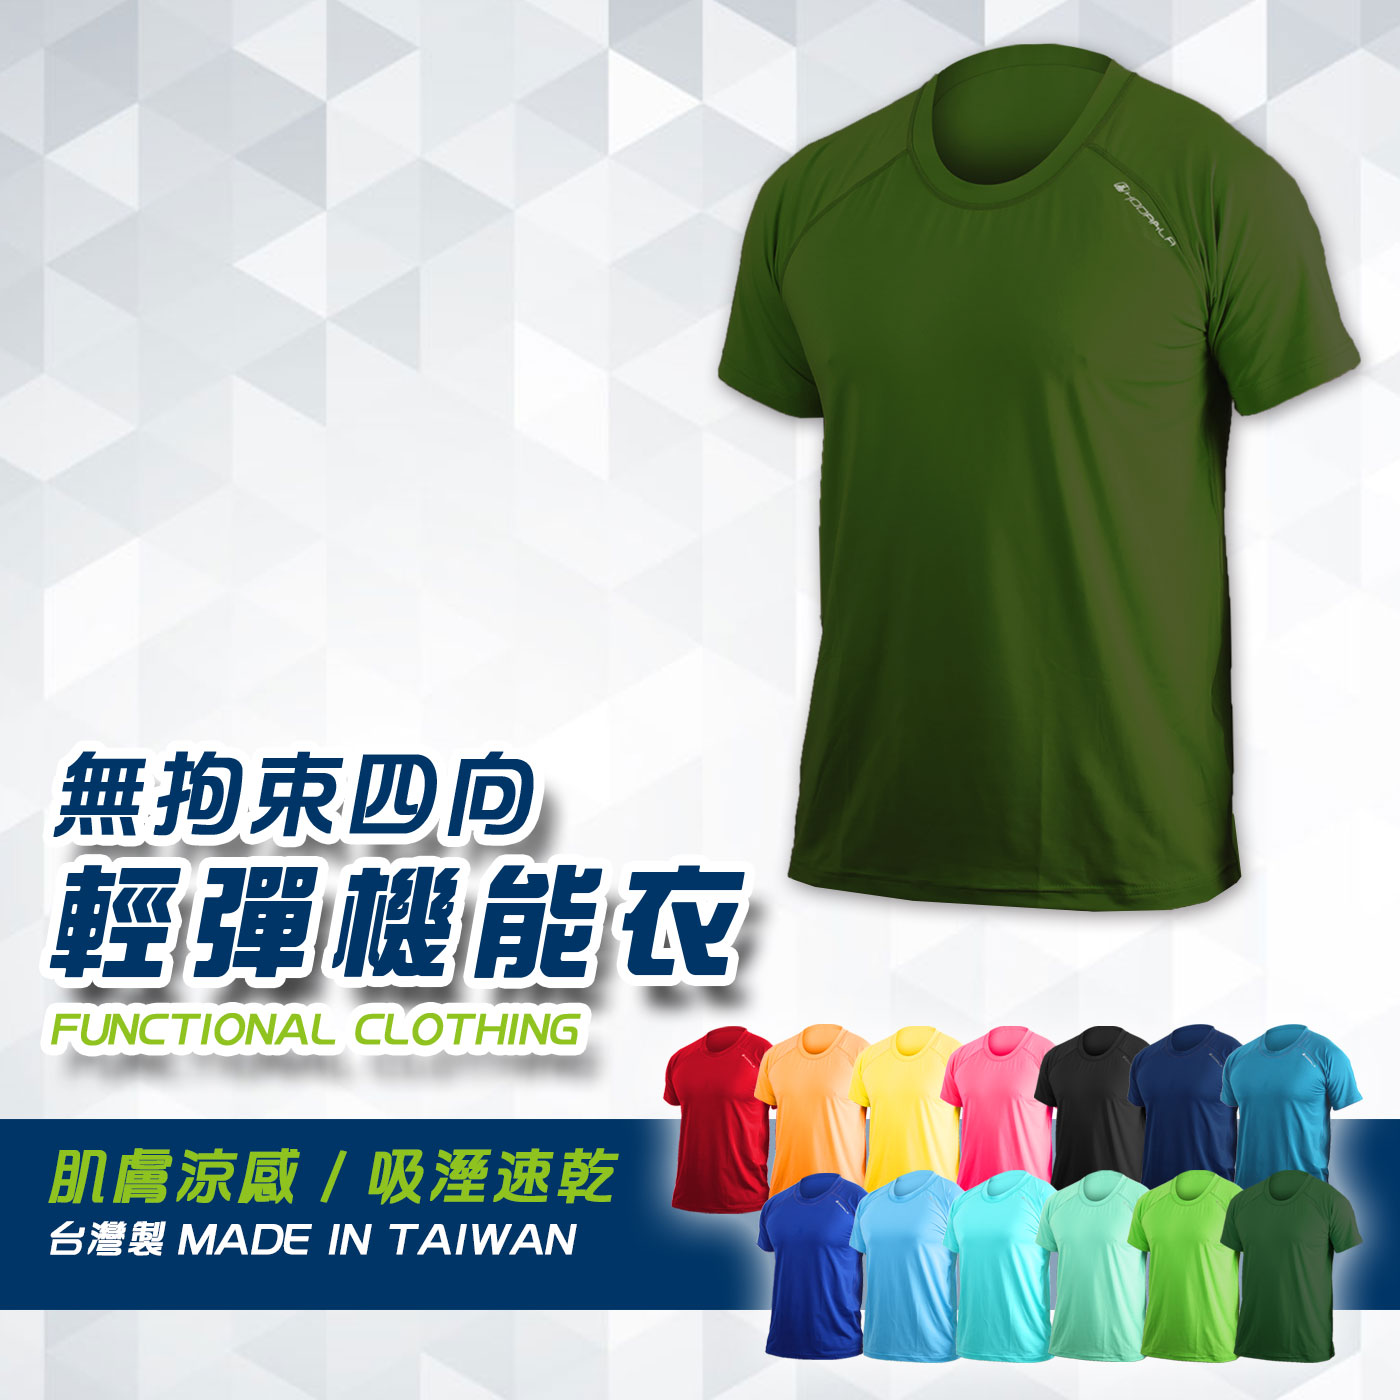 HODARLA 男女無拘束短袖T恤-輕彈 抗UV 圓領 台灣製 涼感 路跑 軍綠@3114812@